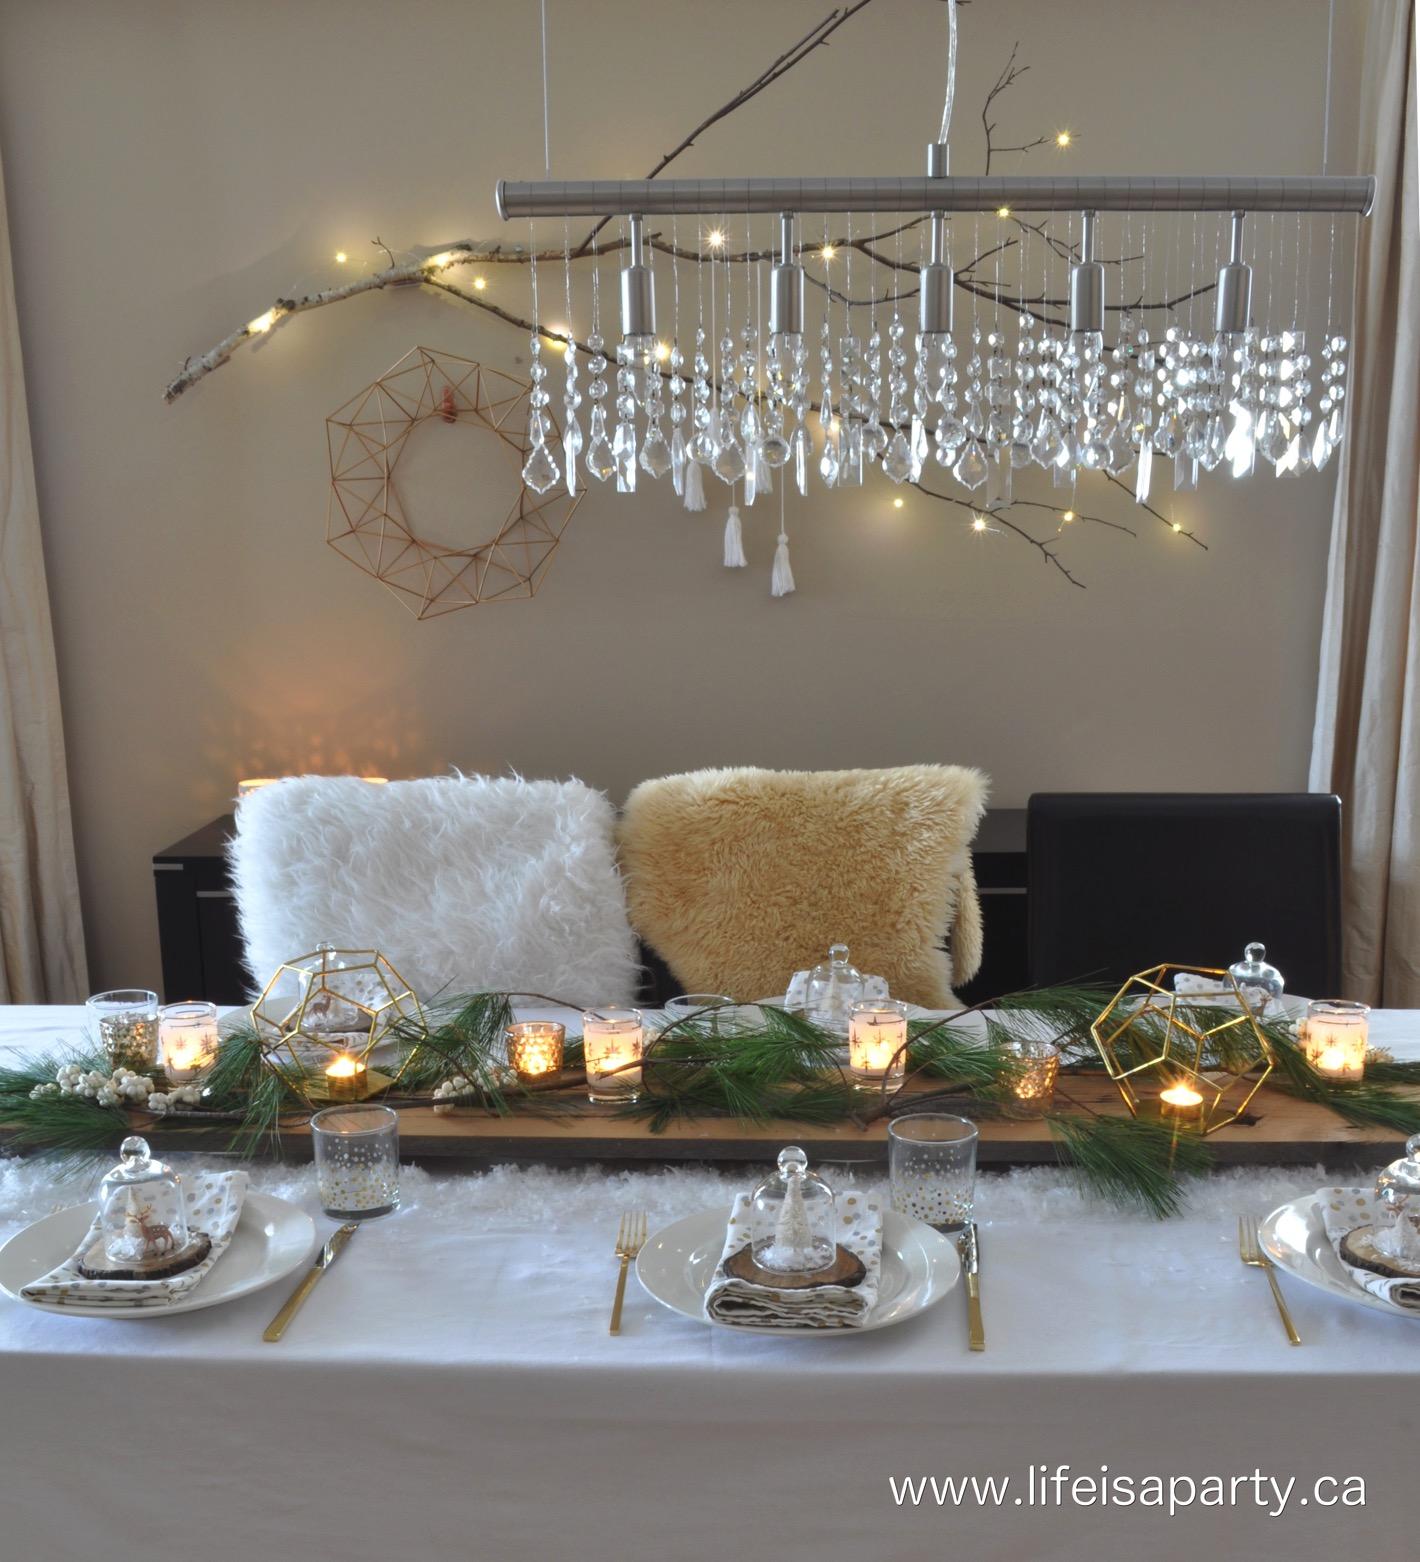 Arreglos navidenos 2018 2019 2 decoracion de interiores fachadas para casas como organizar - Arreglos navidenos para la casa ...